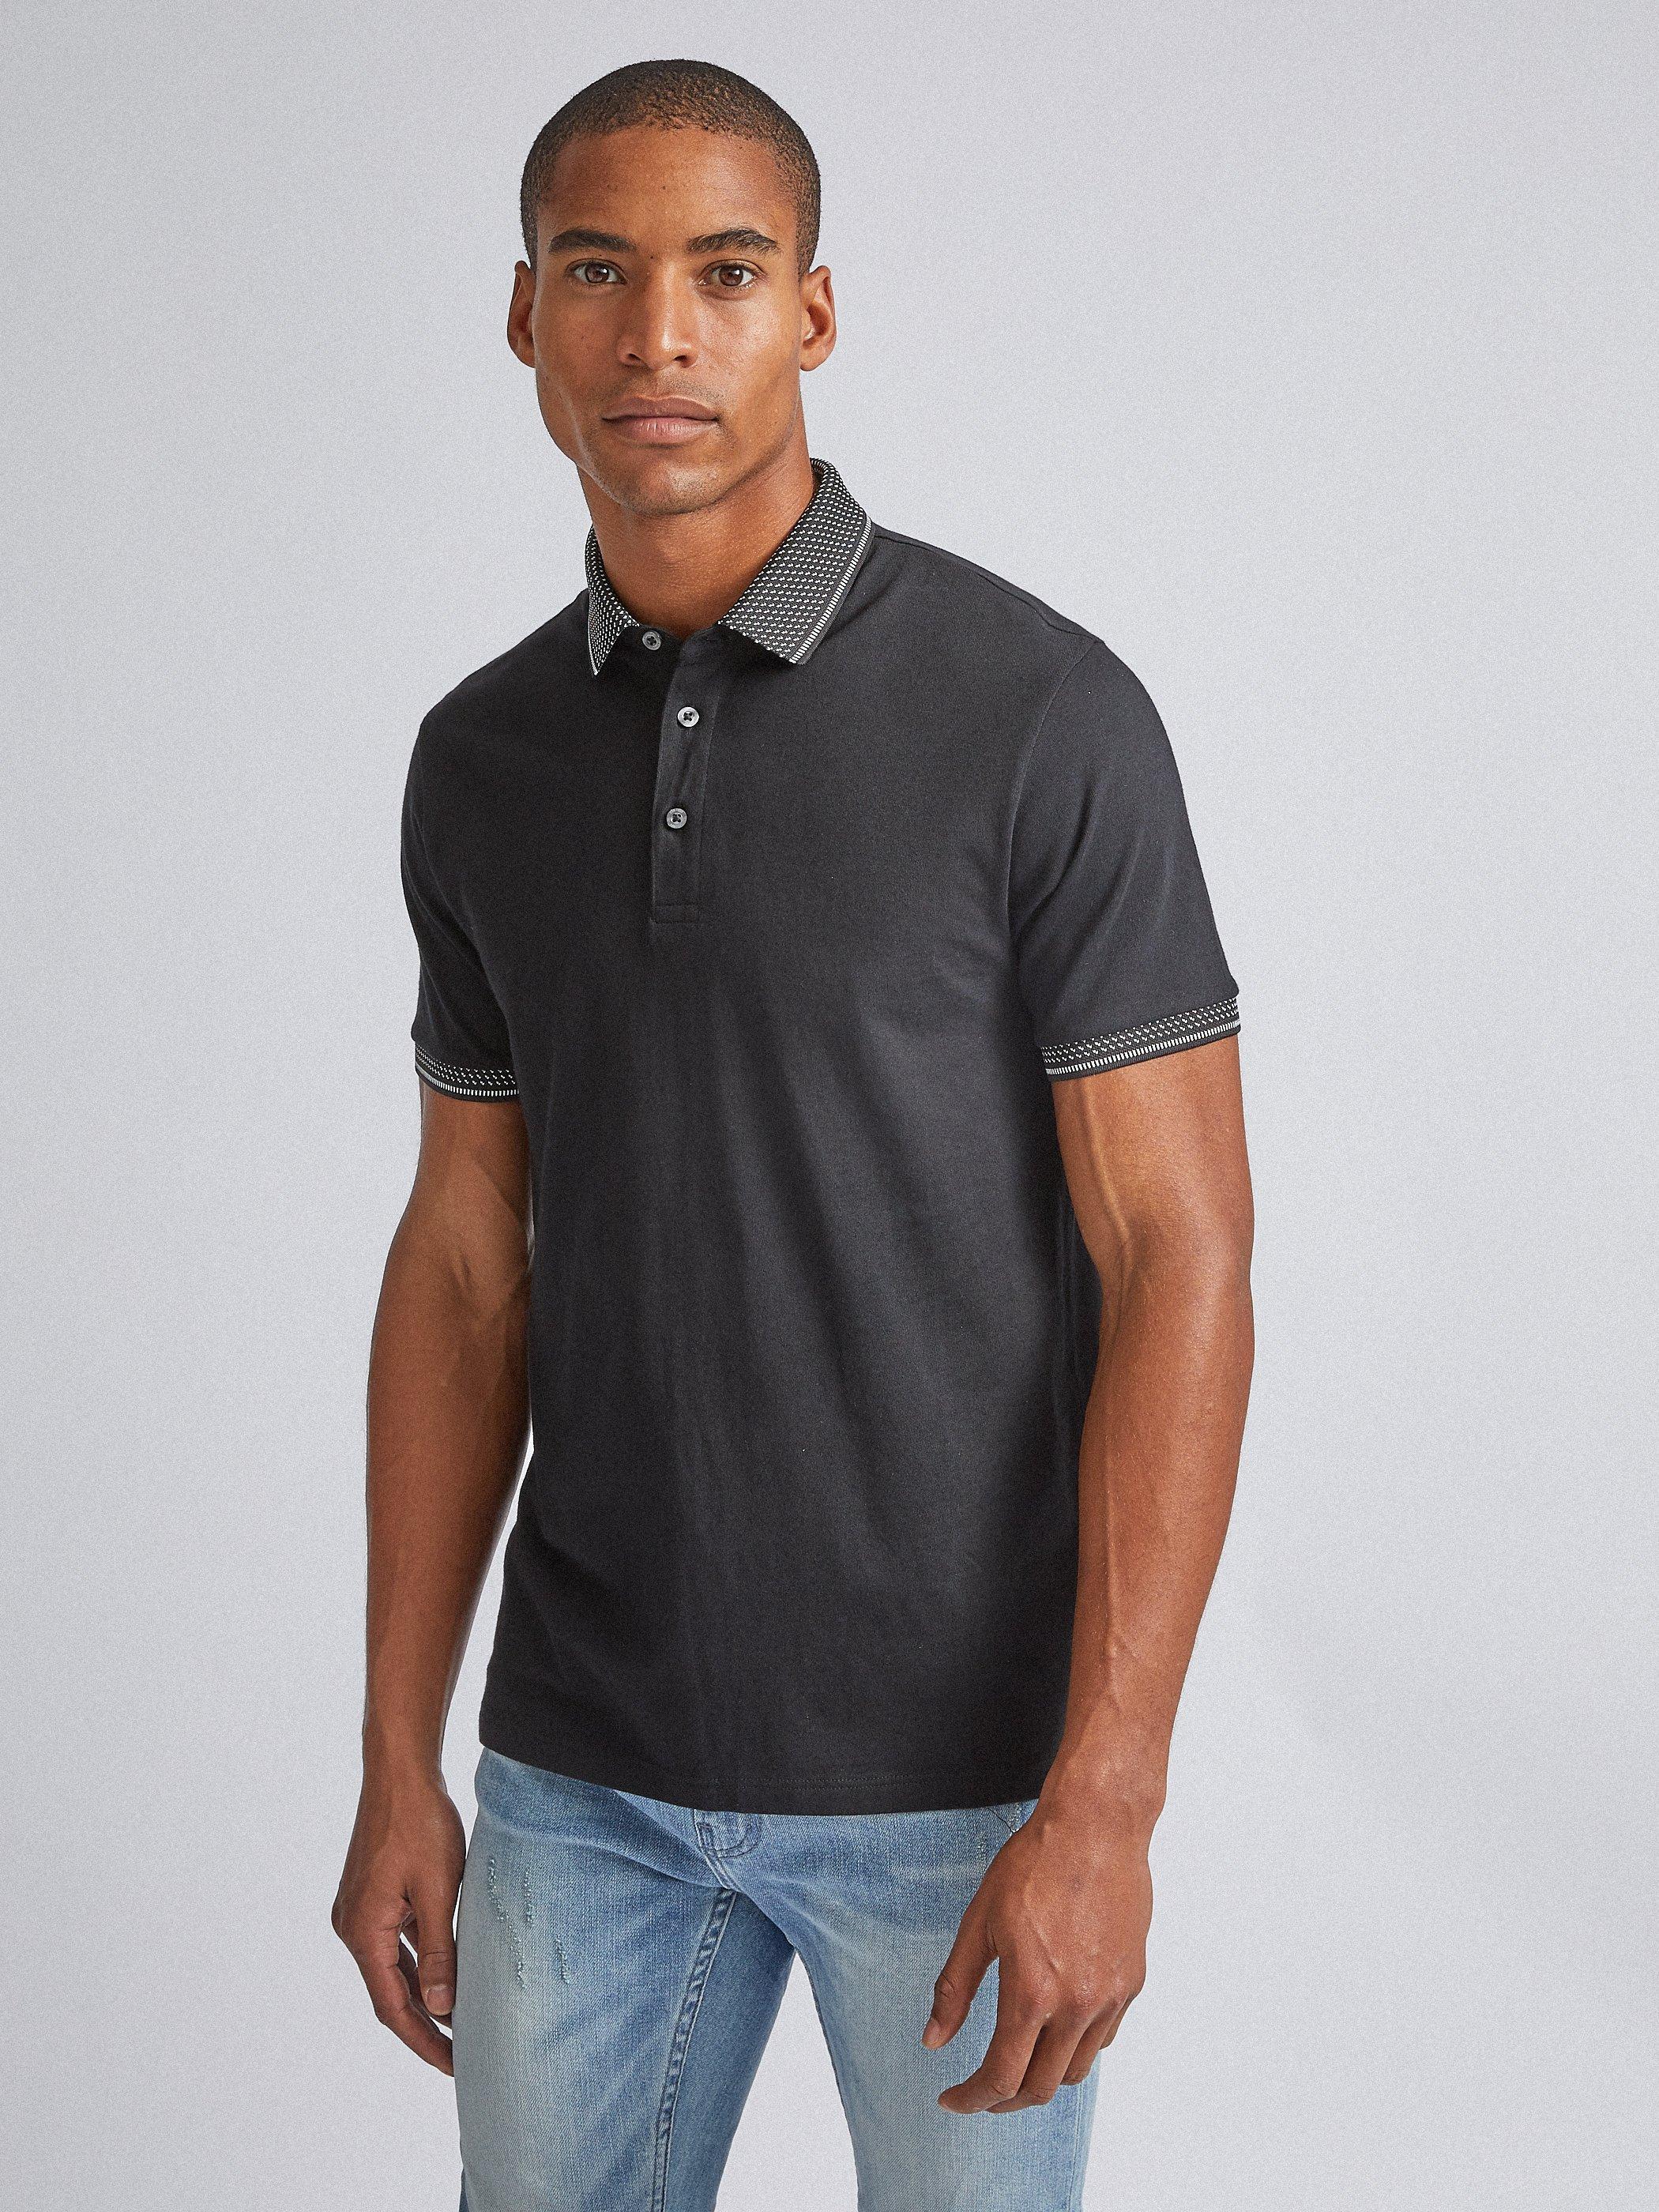 Men'S Black Jacquard Collar Polo Shirt - S